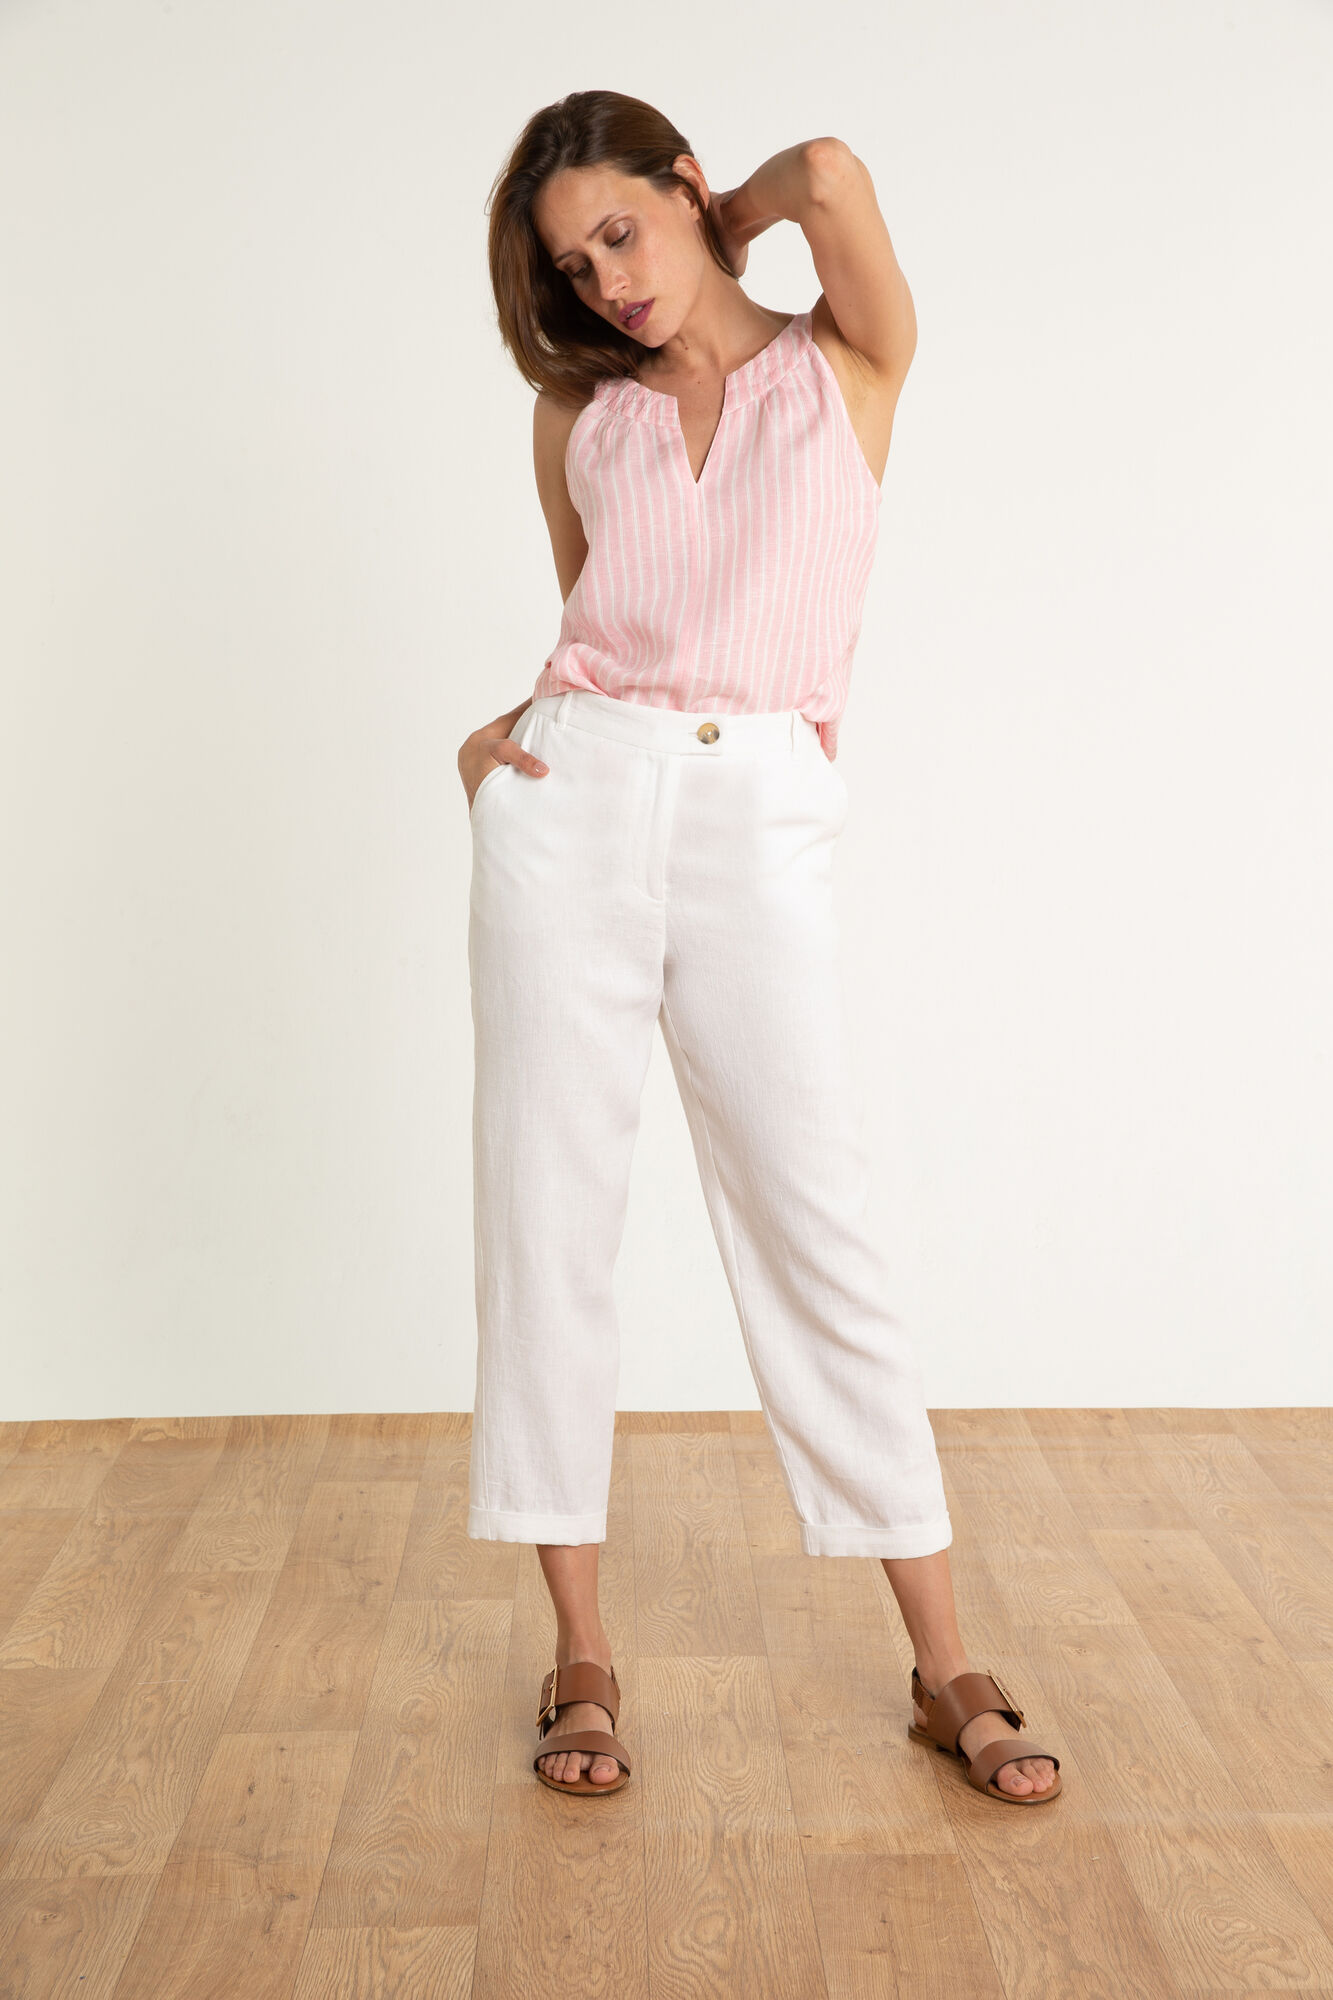 fd6c330911455 Pantalon en lin Varadero : Pantalon femme Blanc en à 75.00 €